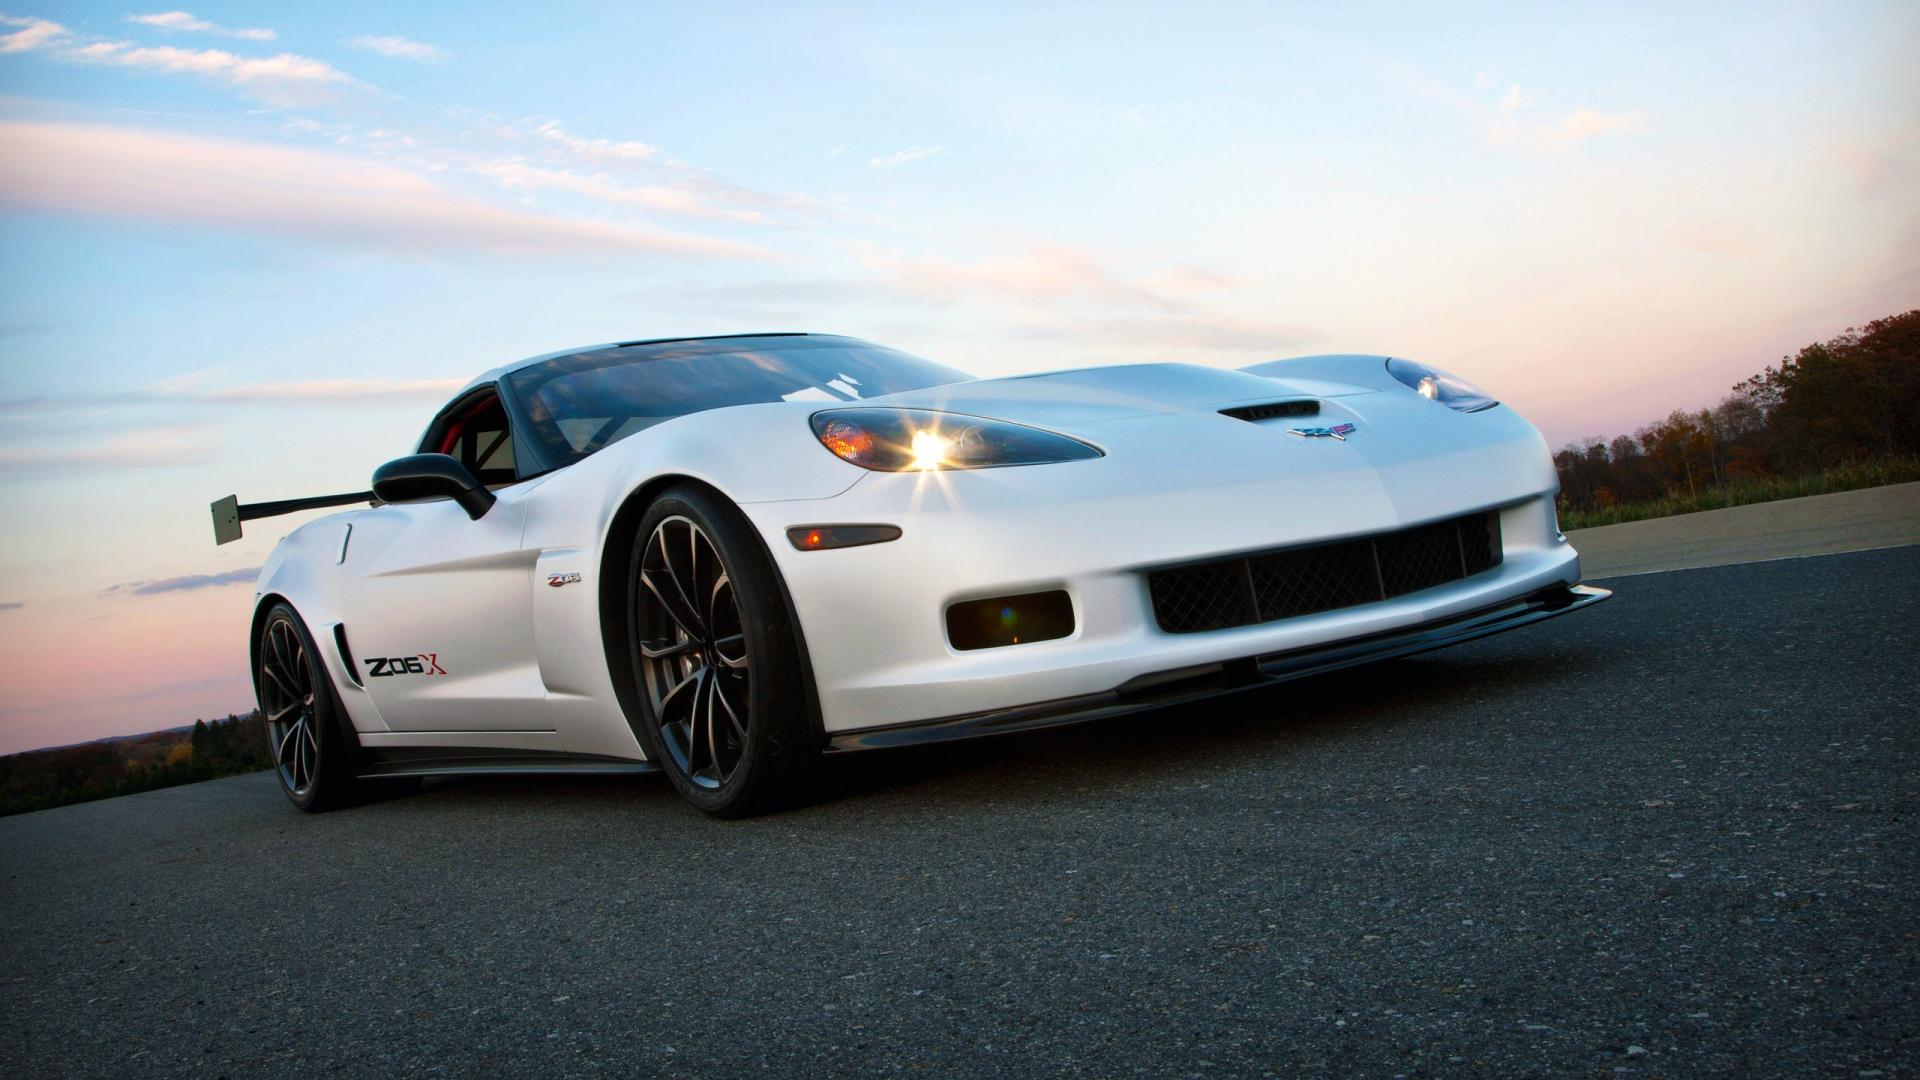 2011 Chevy Corvette | 1920 x 1080 | Download | Close